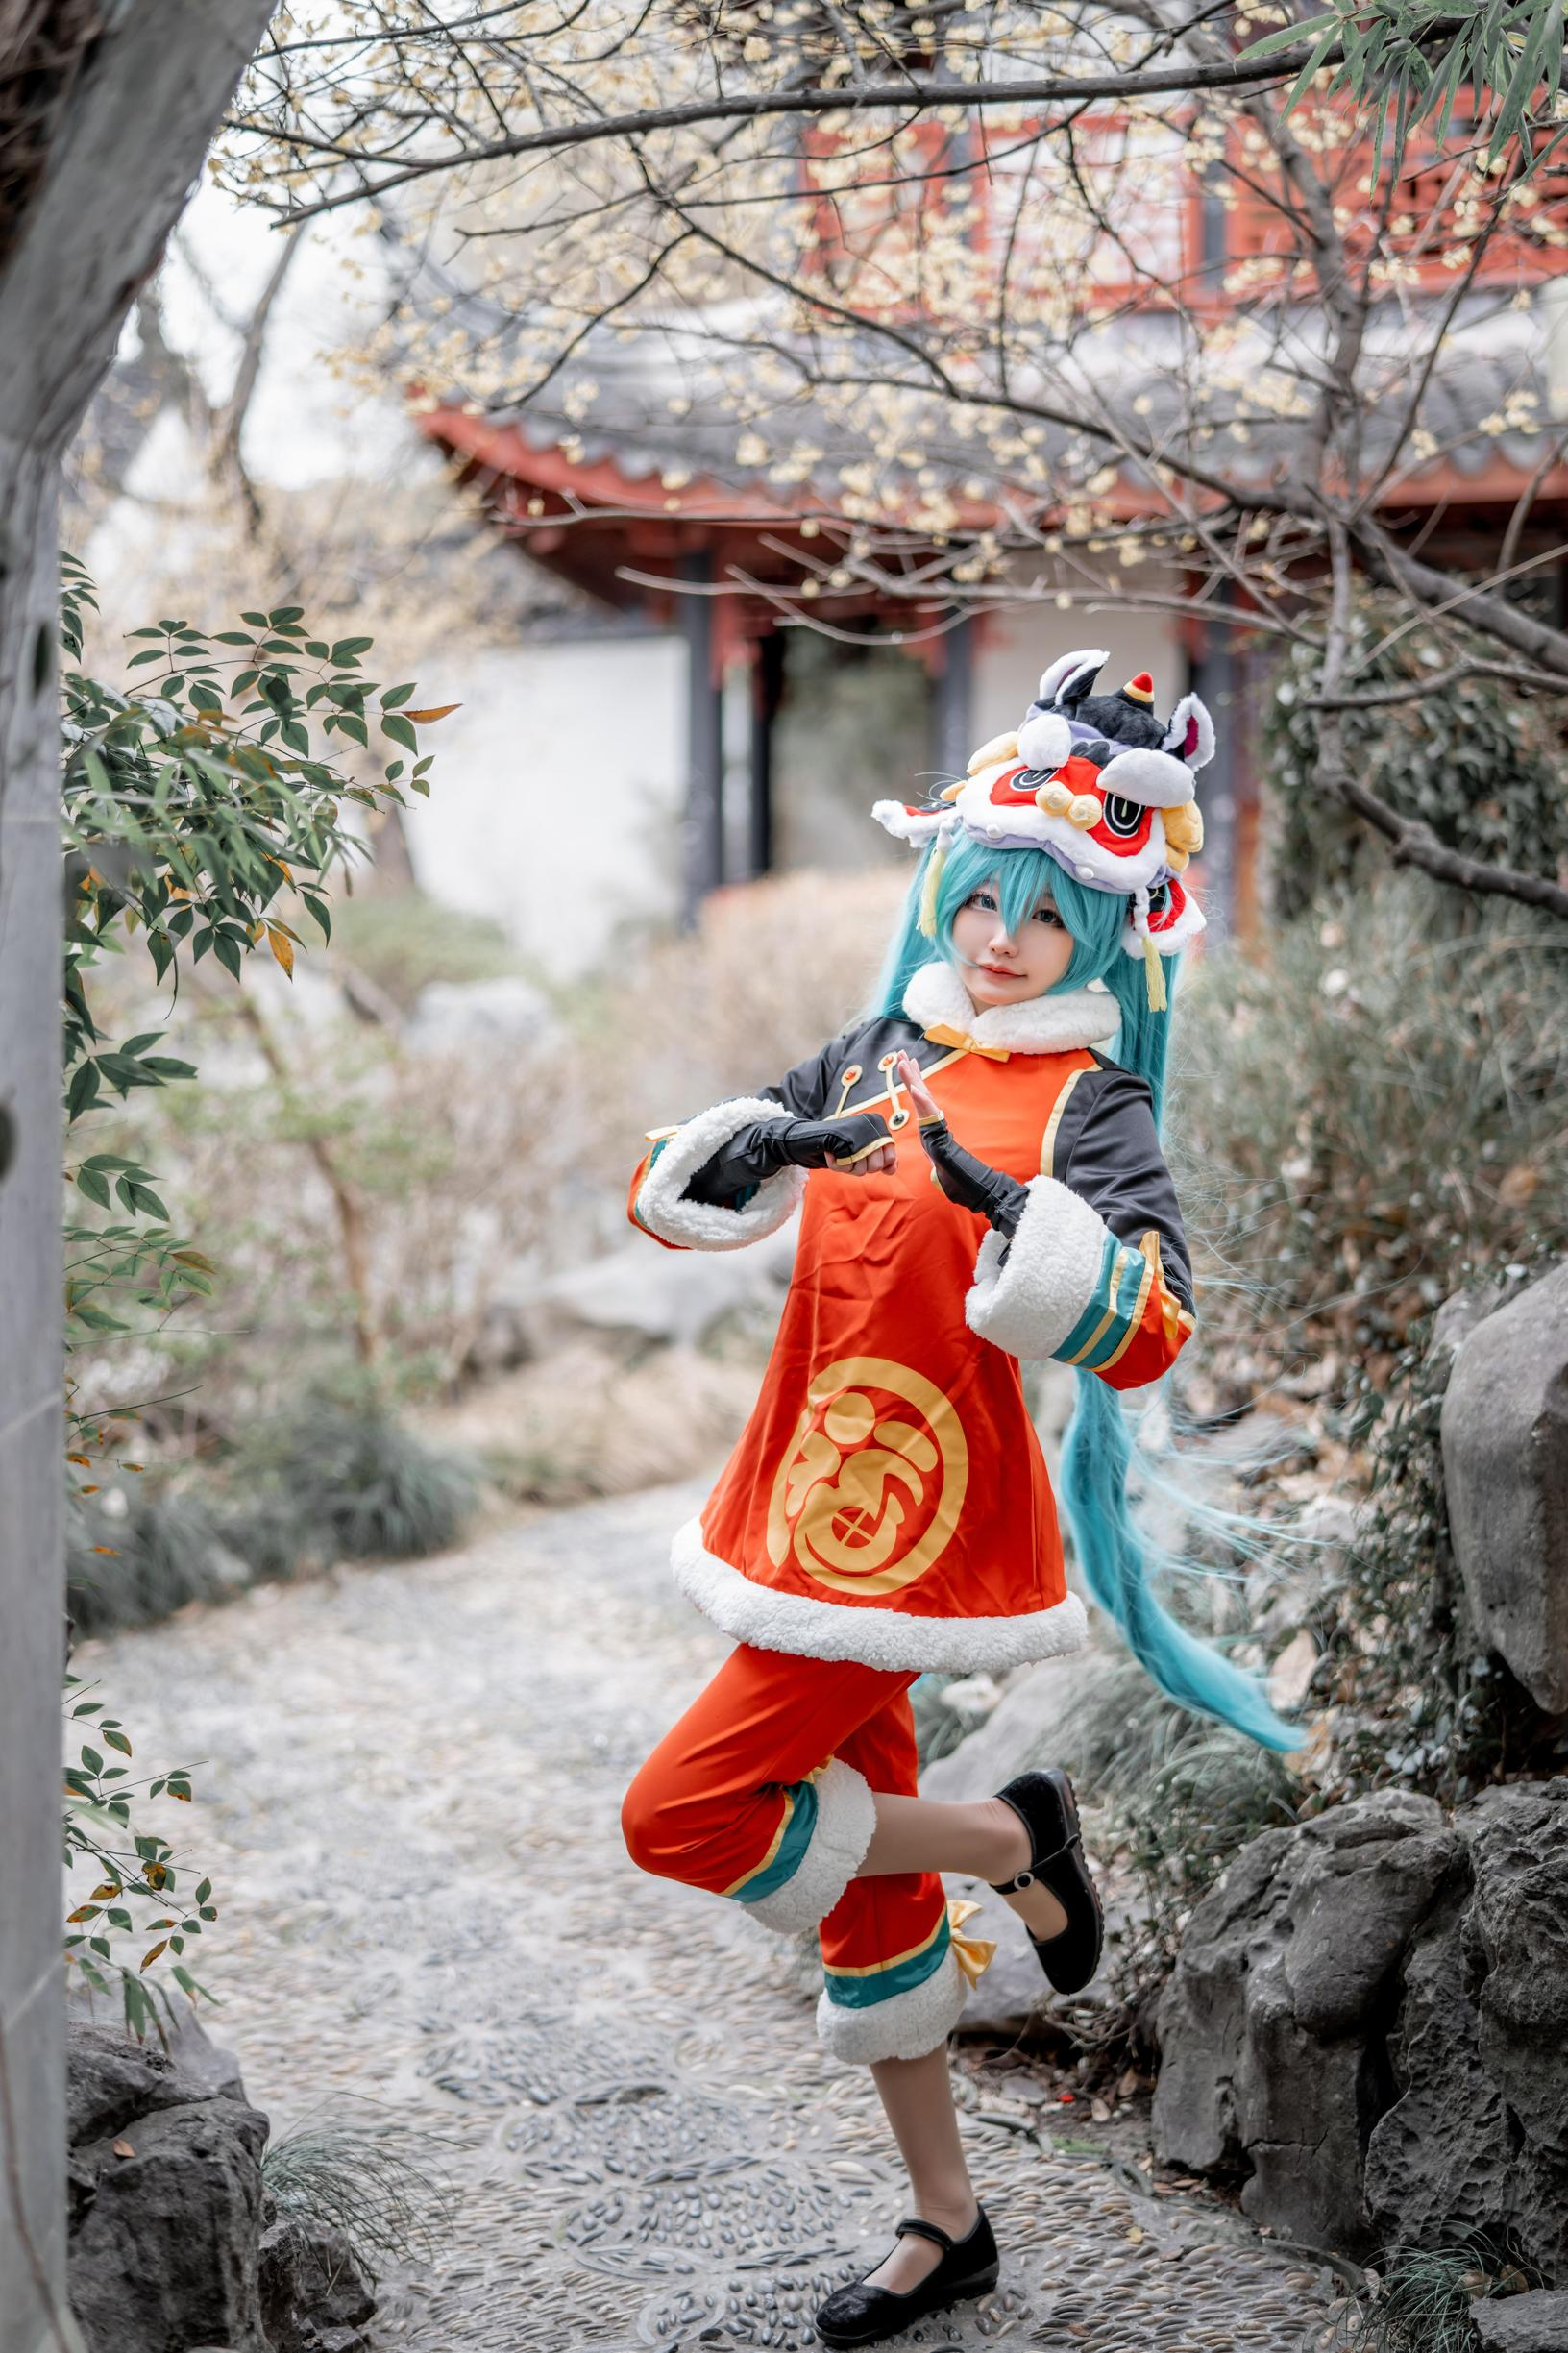 《VOCALOID》正片cosplay【CN:_天小然_】-第6张